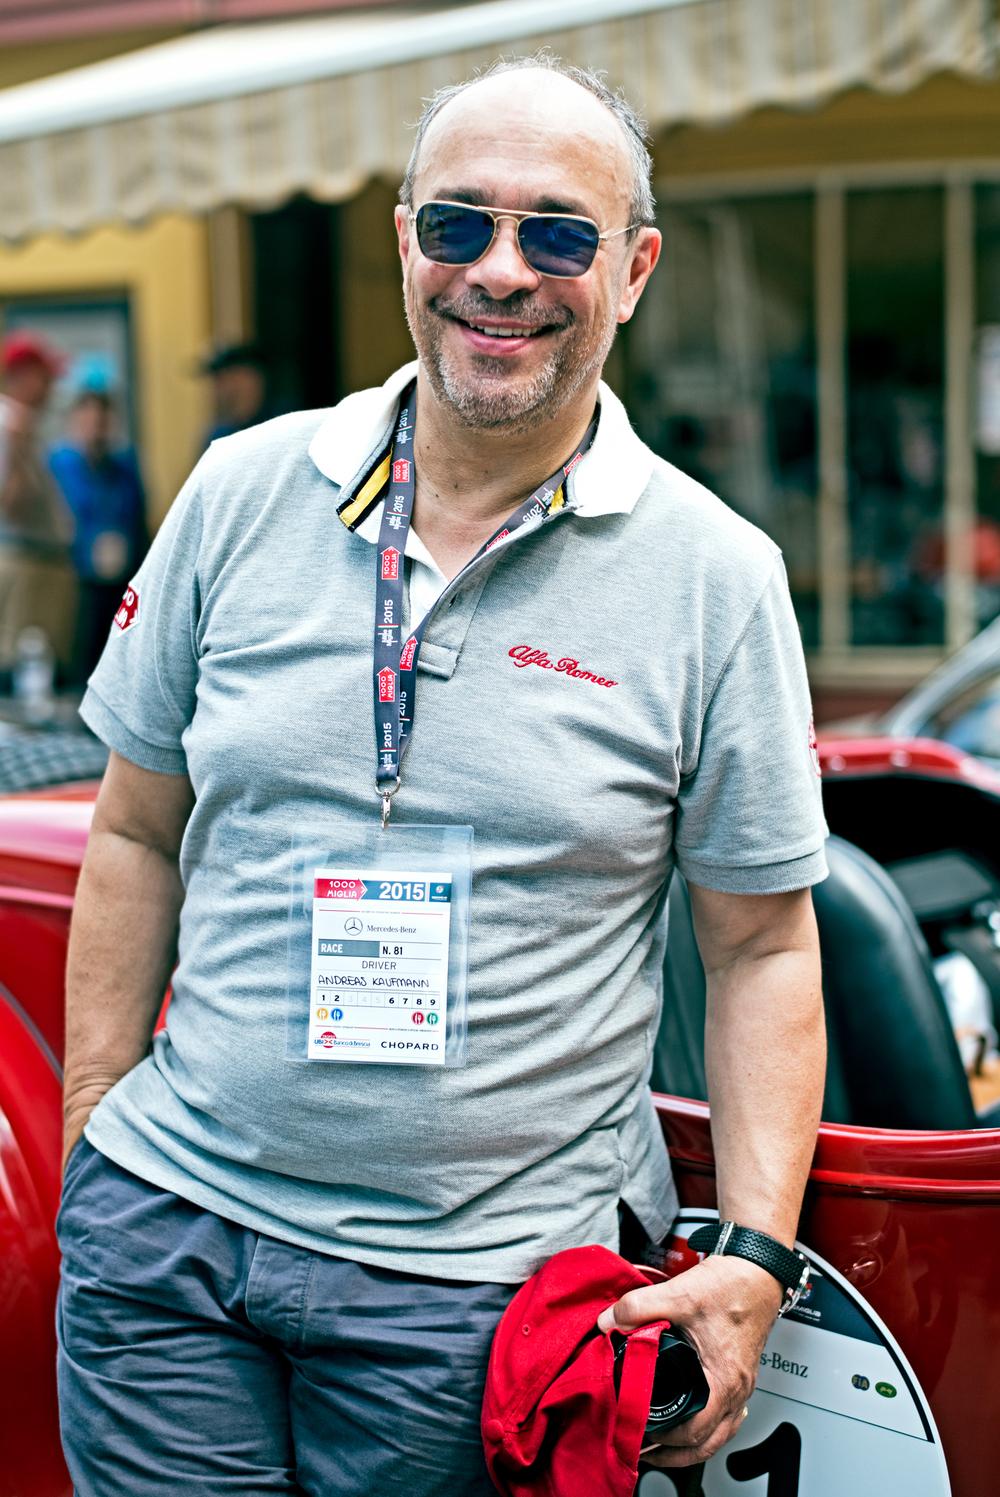 Leica Chairman.  Dr. Kaufmann